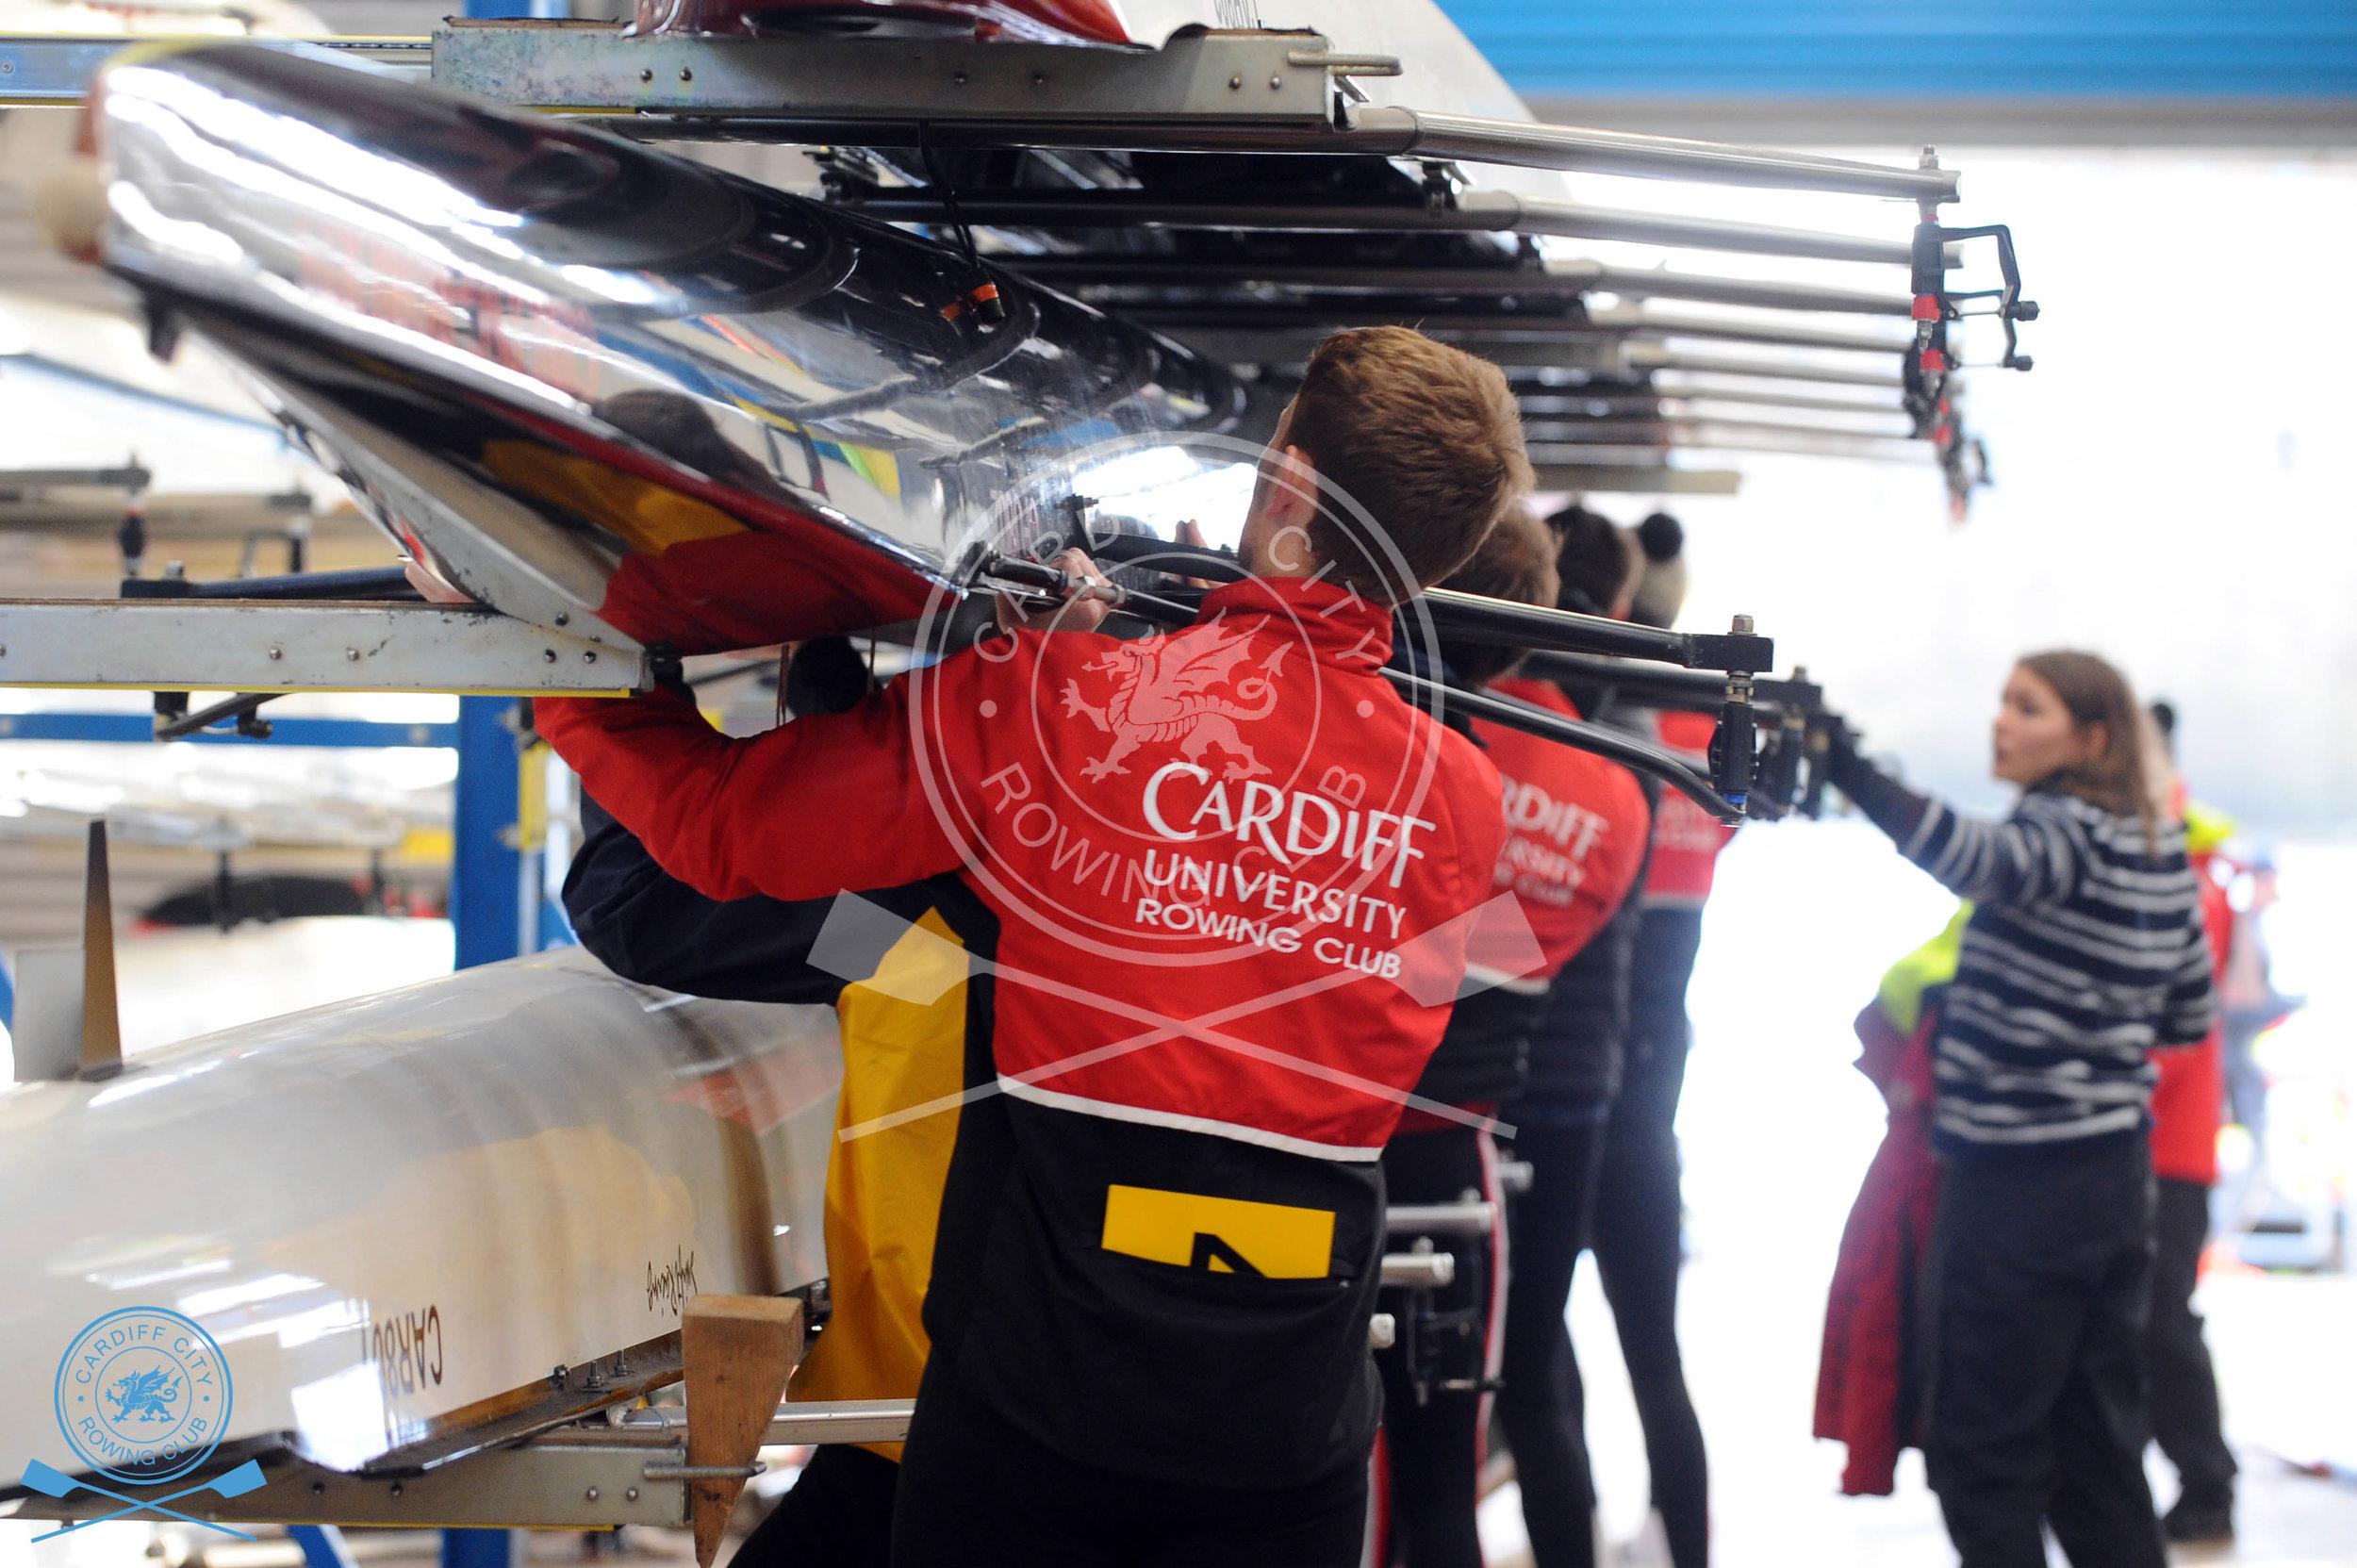 DW_280119_Cardiff_City_Rowing_46.jpg